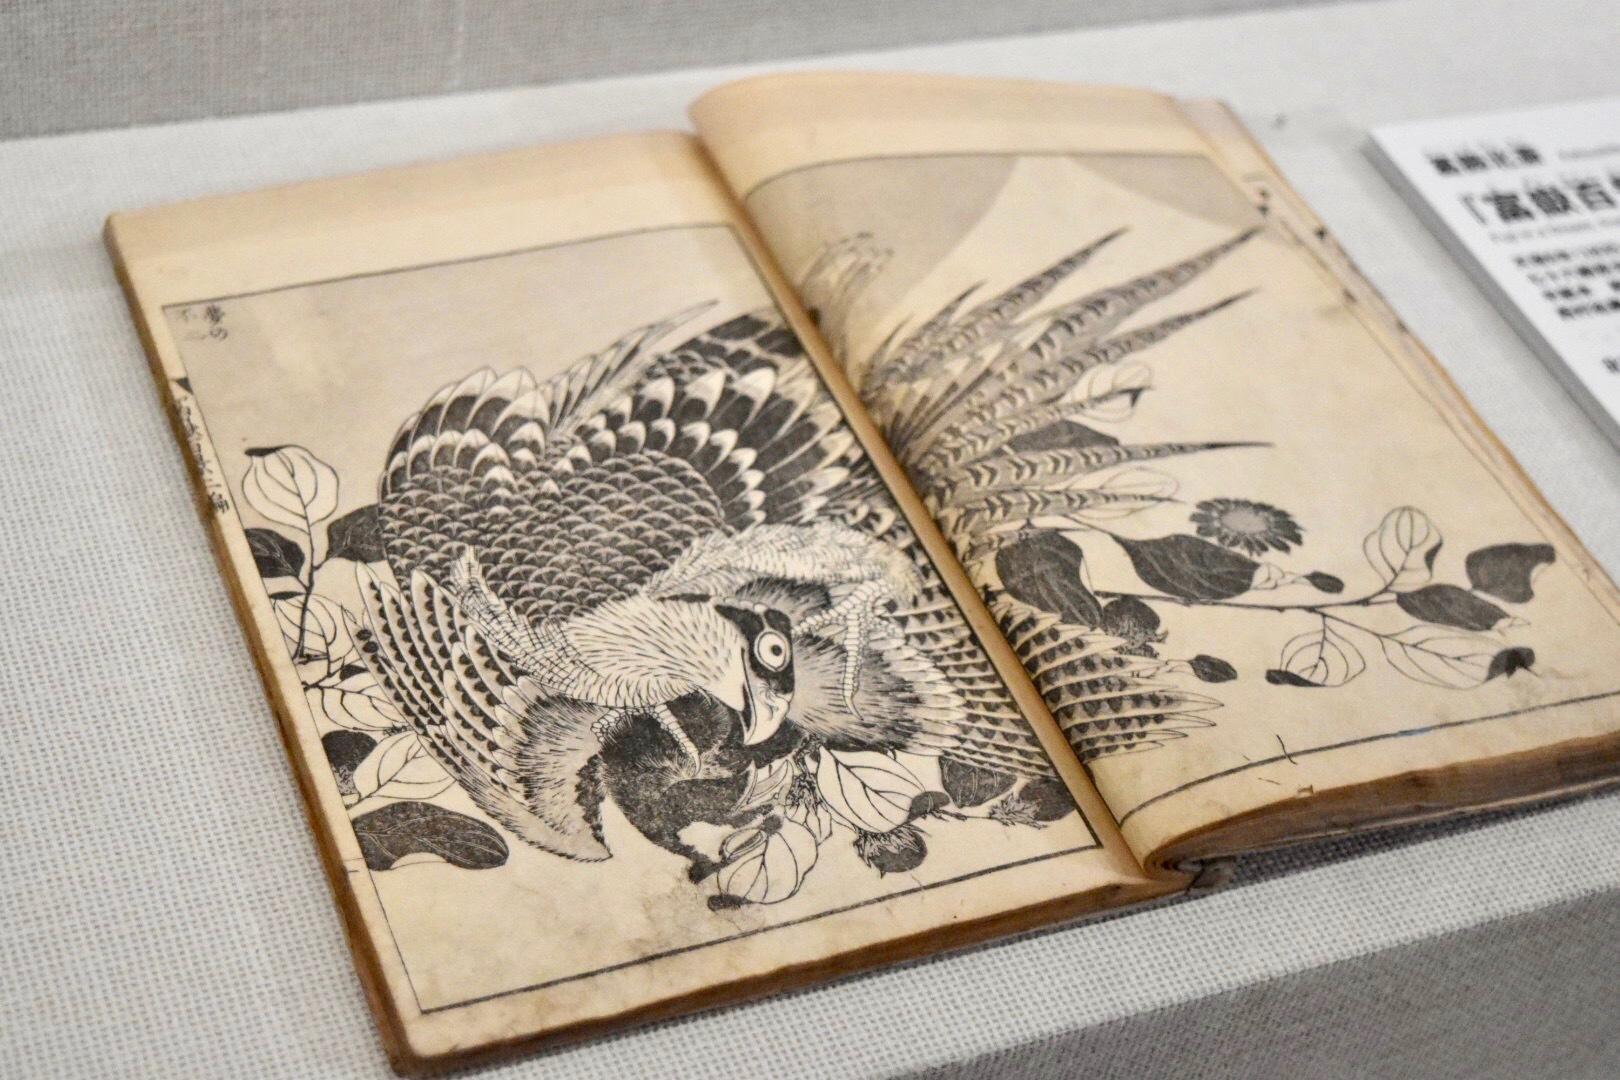 葛飾北斎 『富嶽百景』二編 夢の不二 天保6年(1835)すみだ北斎美術館所蔵